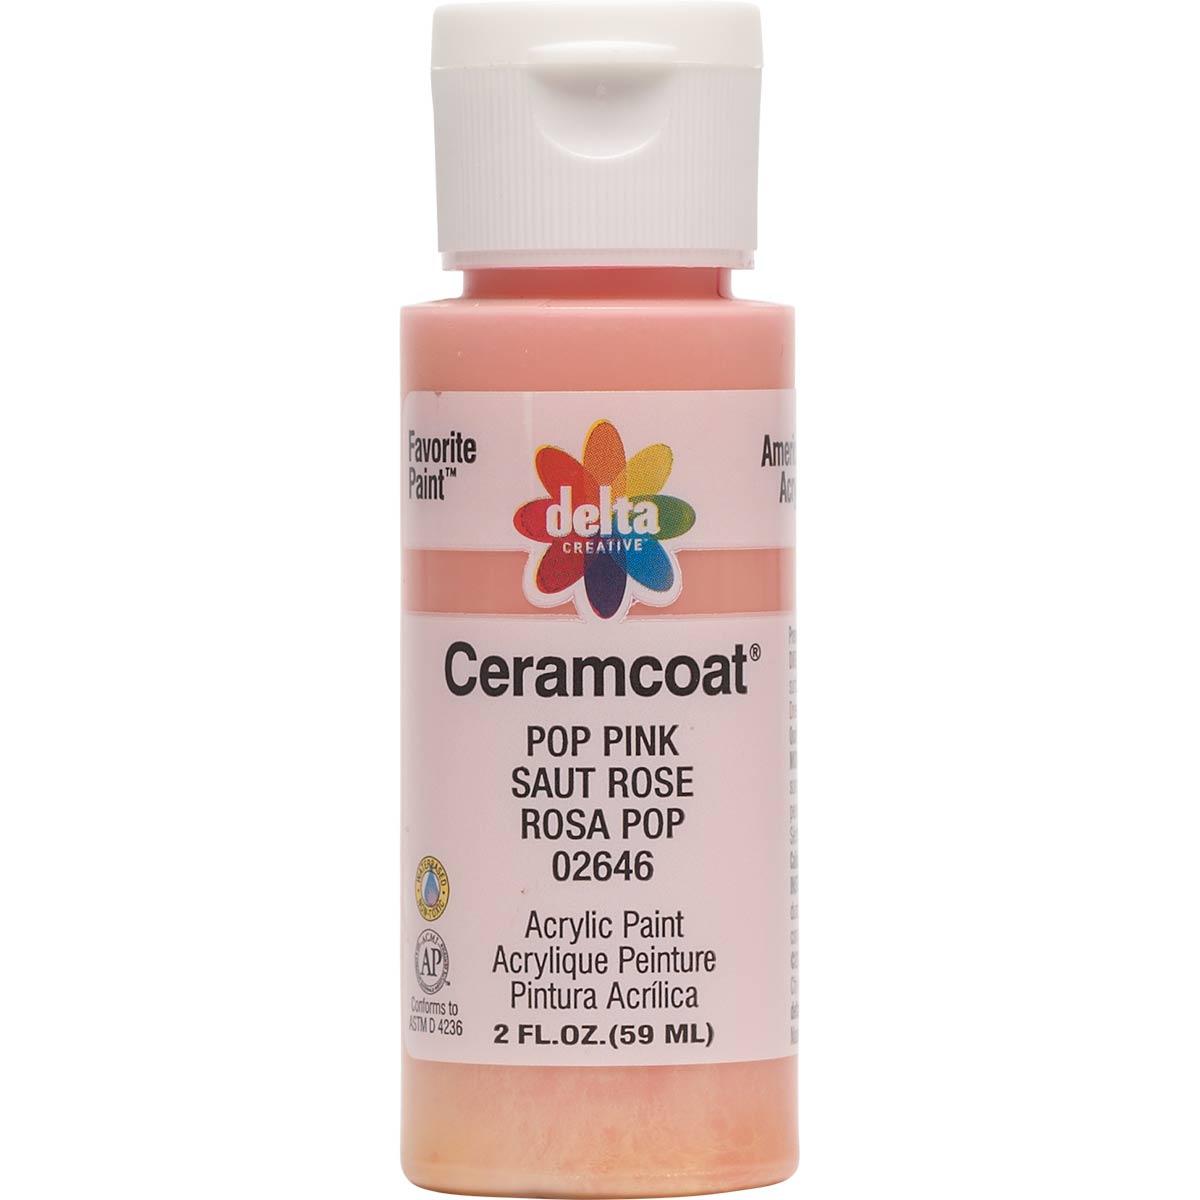 Delta Ceramcoat ® Acrylic Paint - Pop Pink, 2 oz.